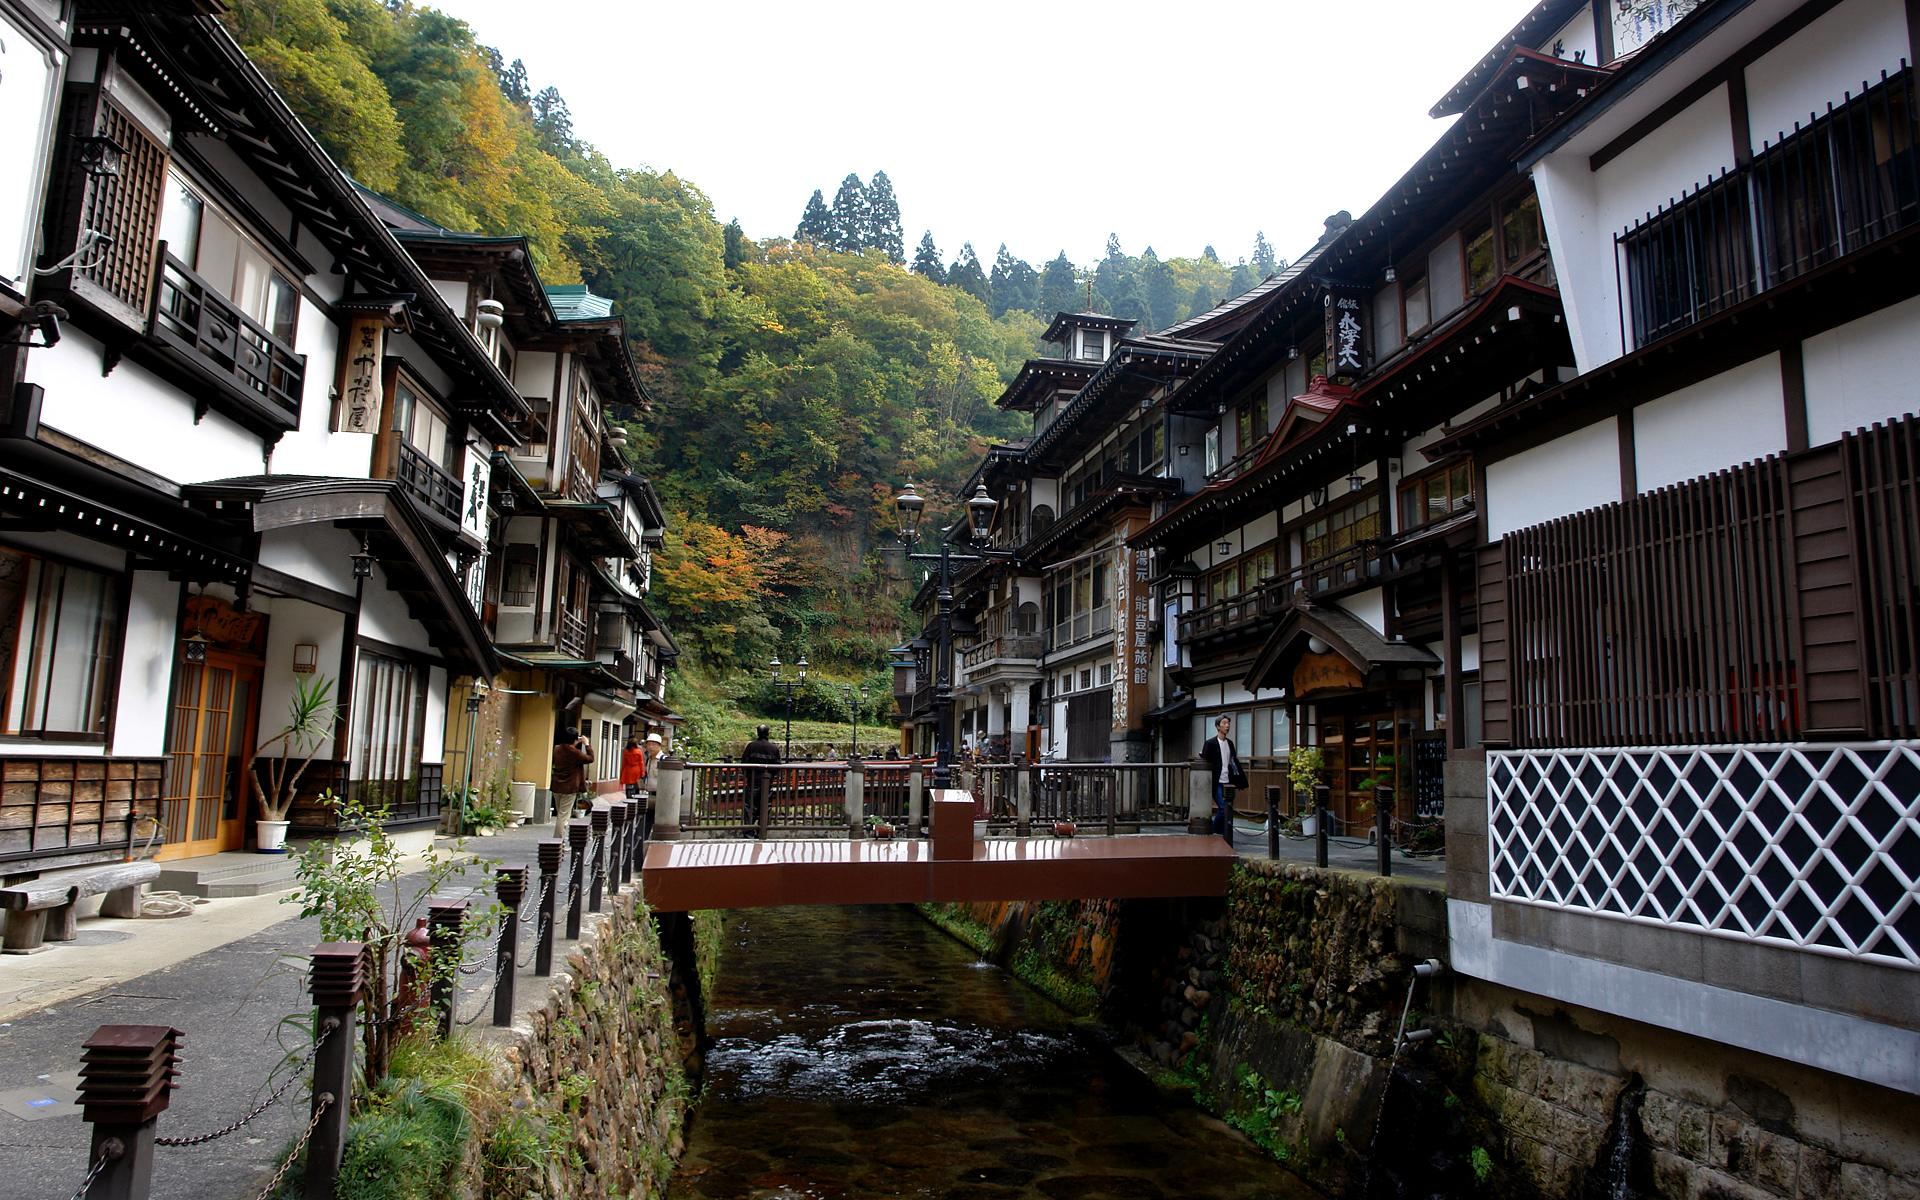 Stroll Around Ginzan Onsen The Nostalgic Onsen Town Of